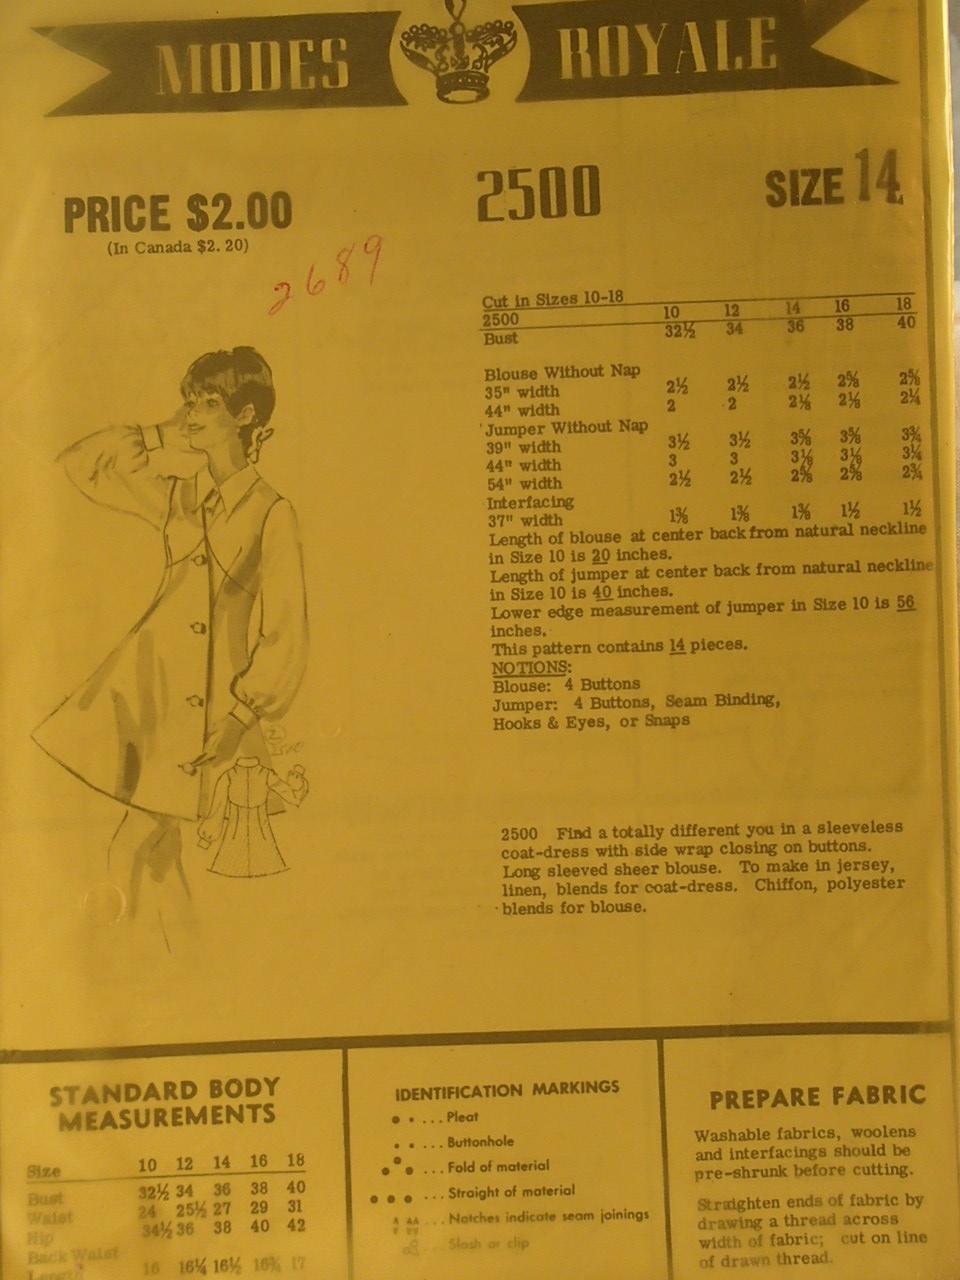 Modes Royale 2500